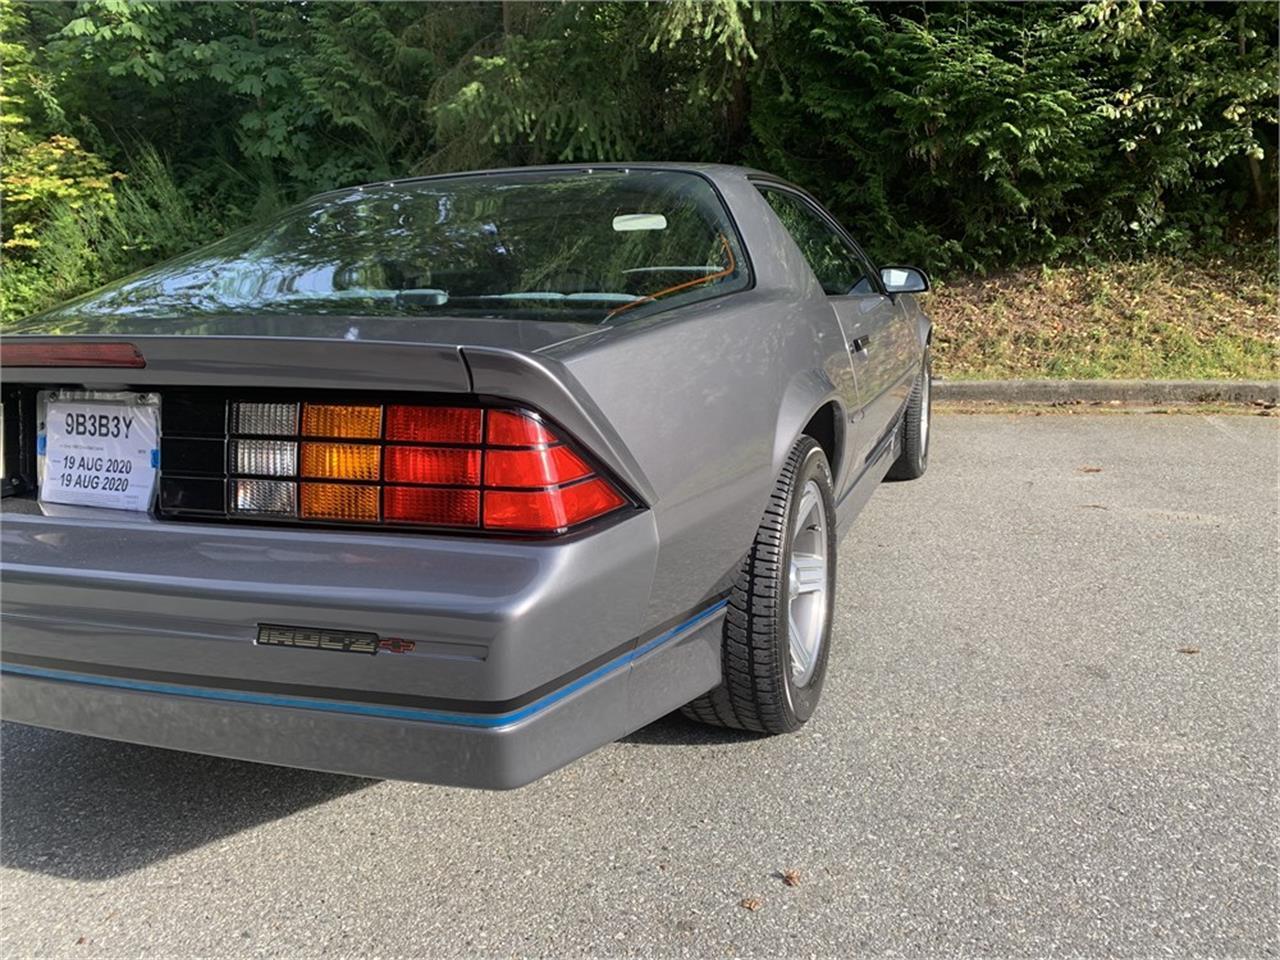 1988 Chevrolet Camaro IROC Z28 (CC-1390300) for sale in Vancouver, British Columbia